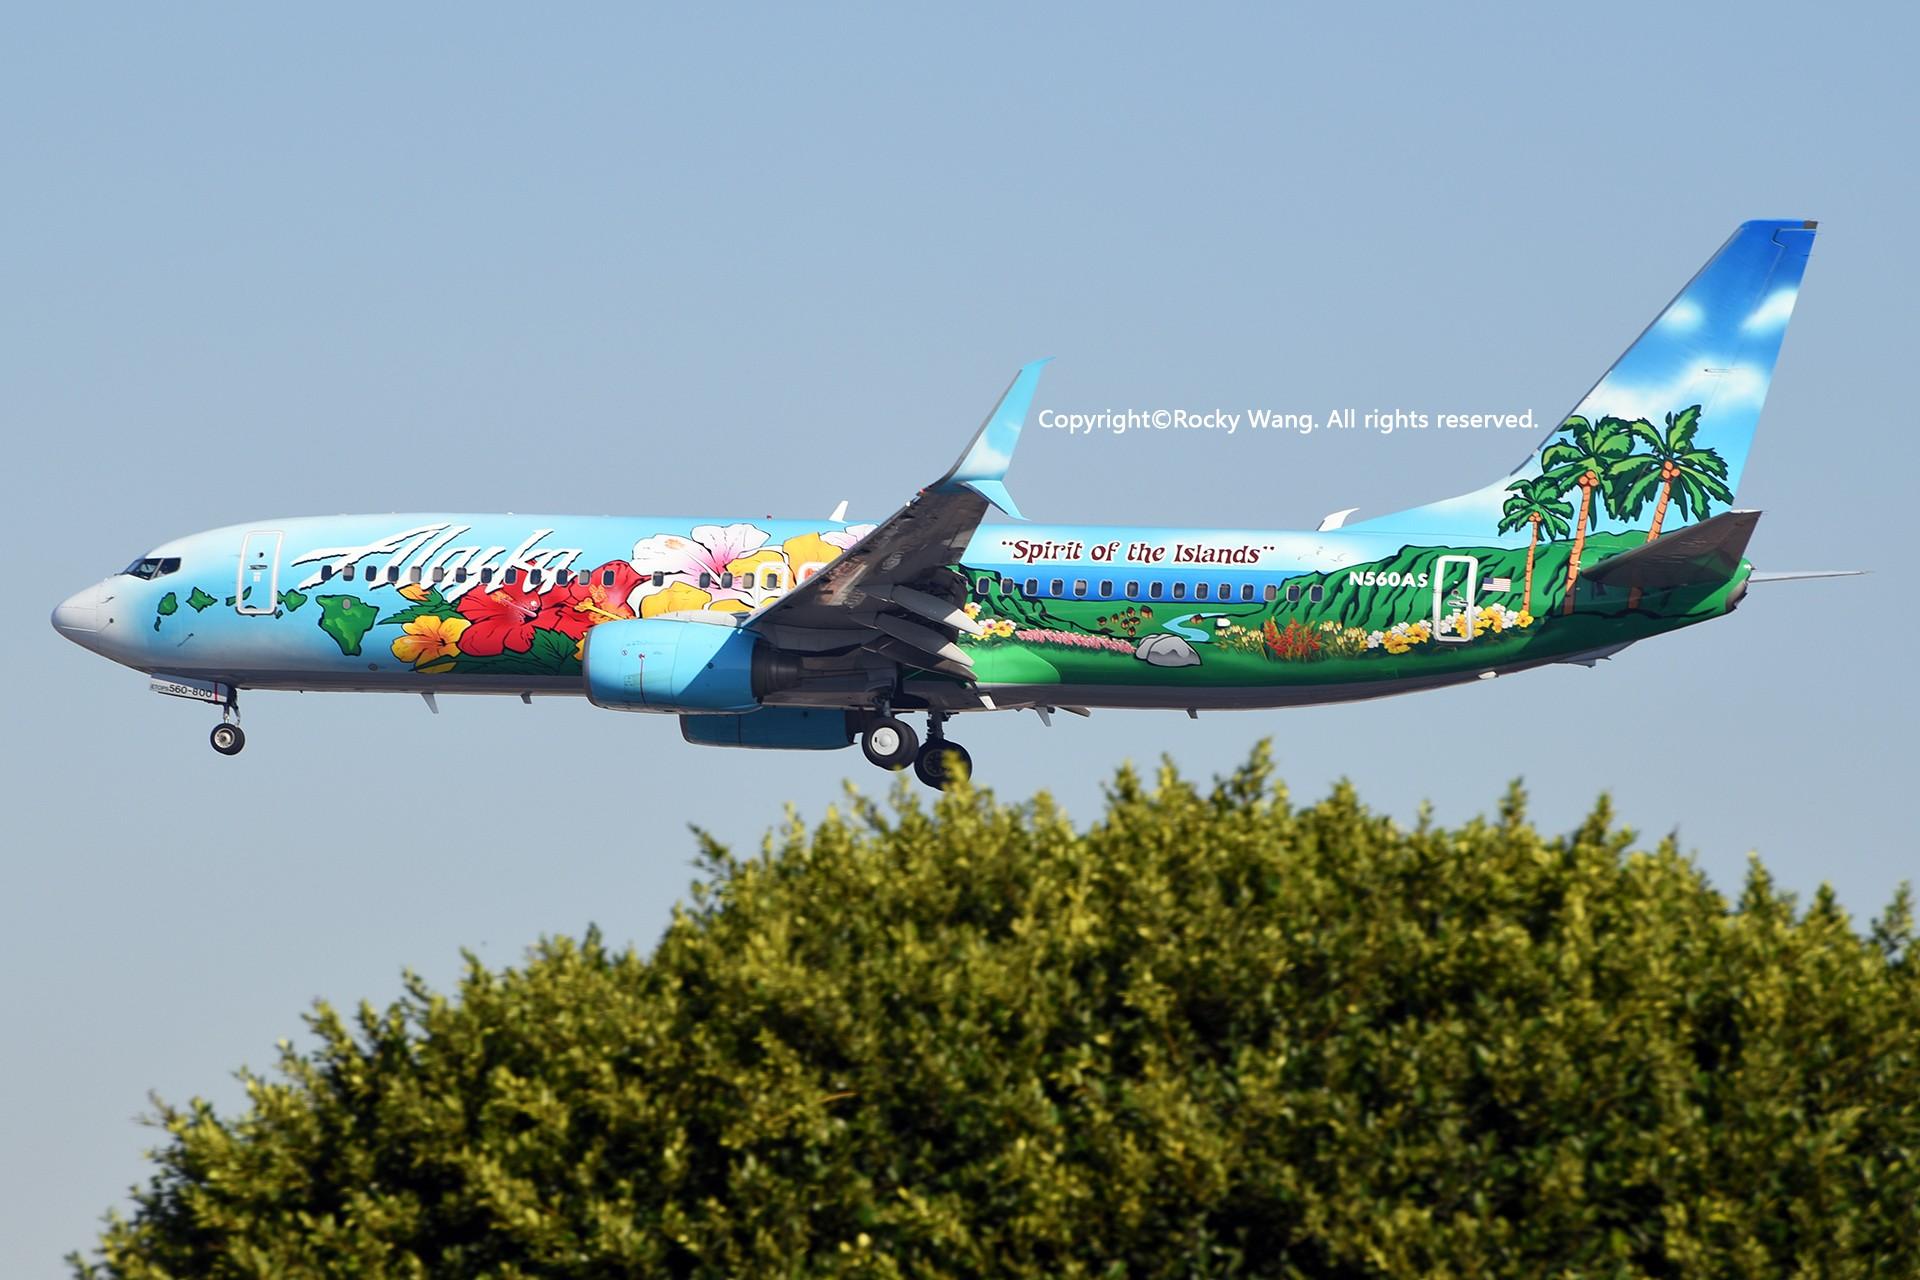 Re:[原创]彩绘圣地-附加彩蛋 BOEING 737-890 N560AS Los Angeles Int'l Airport